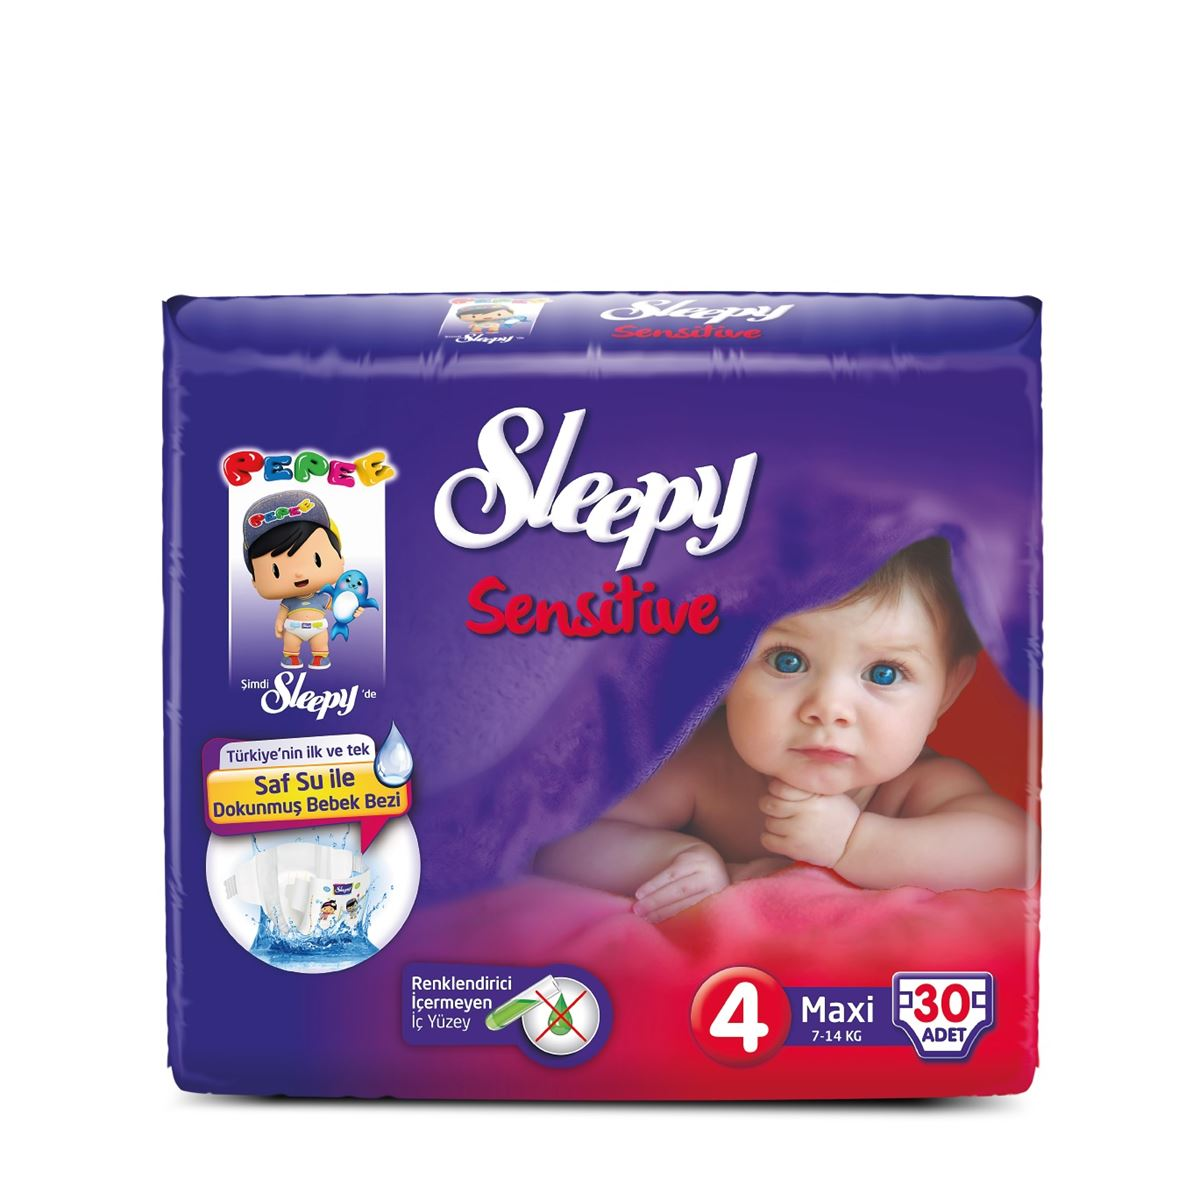 Sleepy Sensitive Pepee Maxi  4 Numara Bebek Bezi